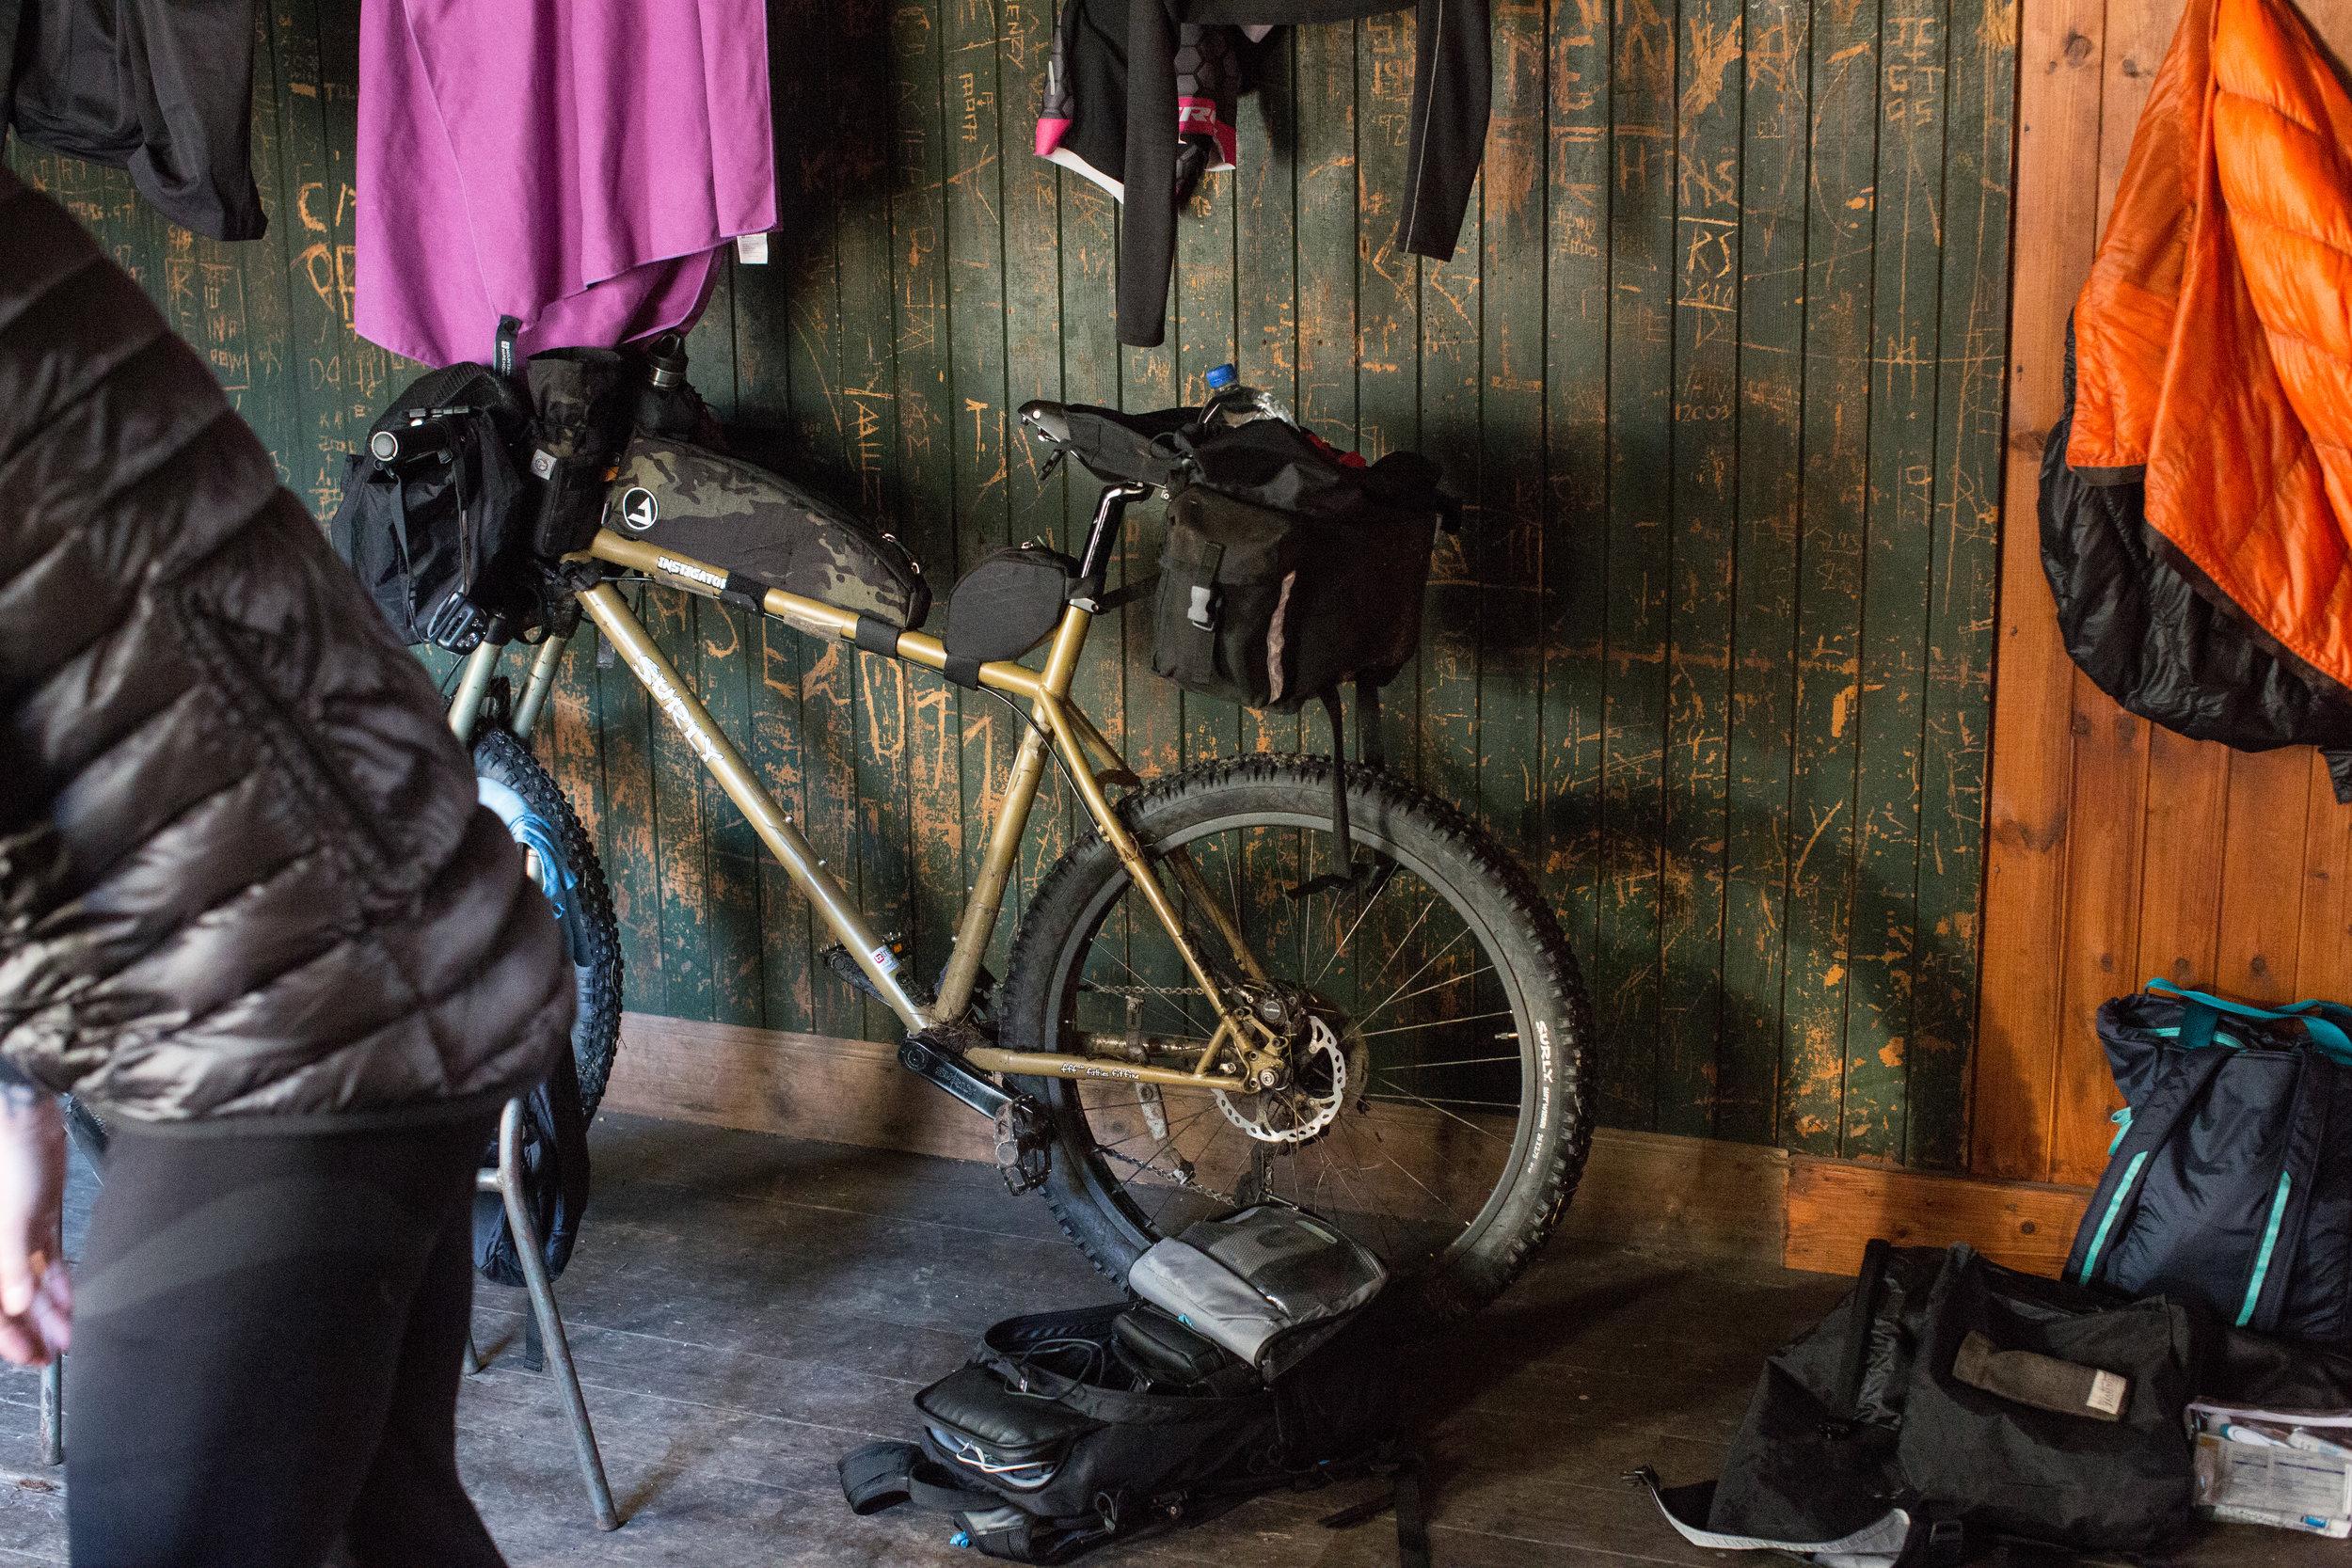 surly, surly bikes, j paks, j paks frame bag, j paks farvapak, farvapak, surly Karate Monkey, surly instigator, surly ecr, ecr, karate monkey, bikepacking, bicycle touring apocalypse, jack mac